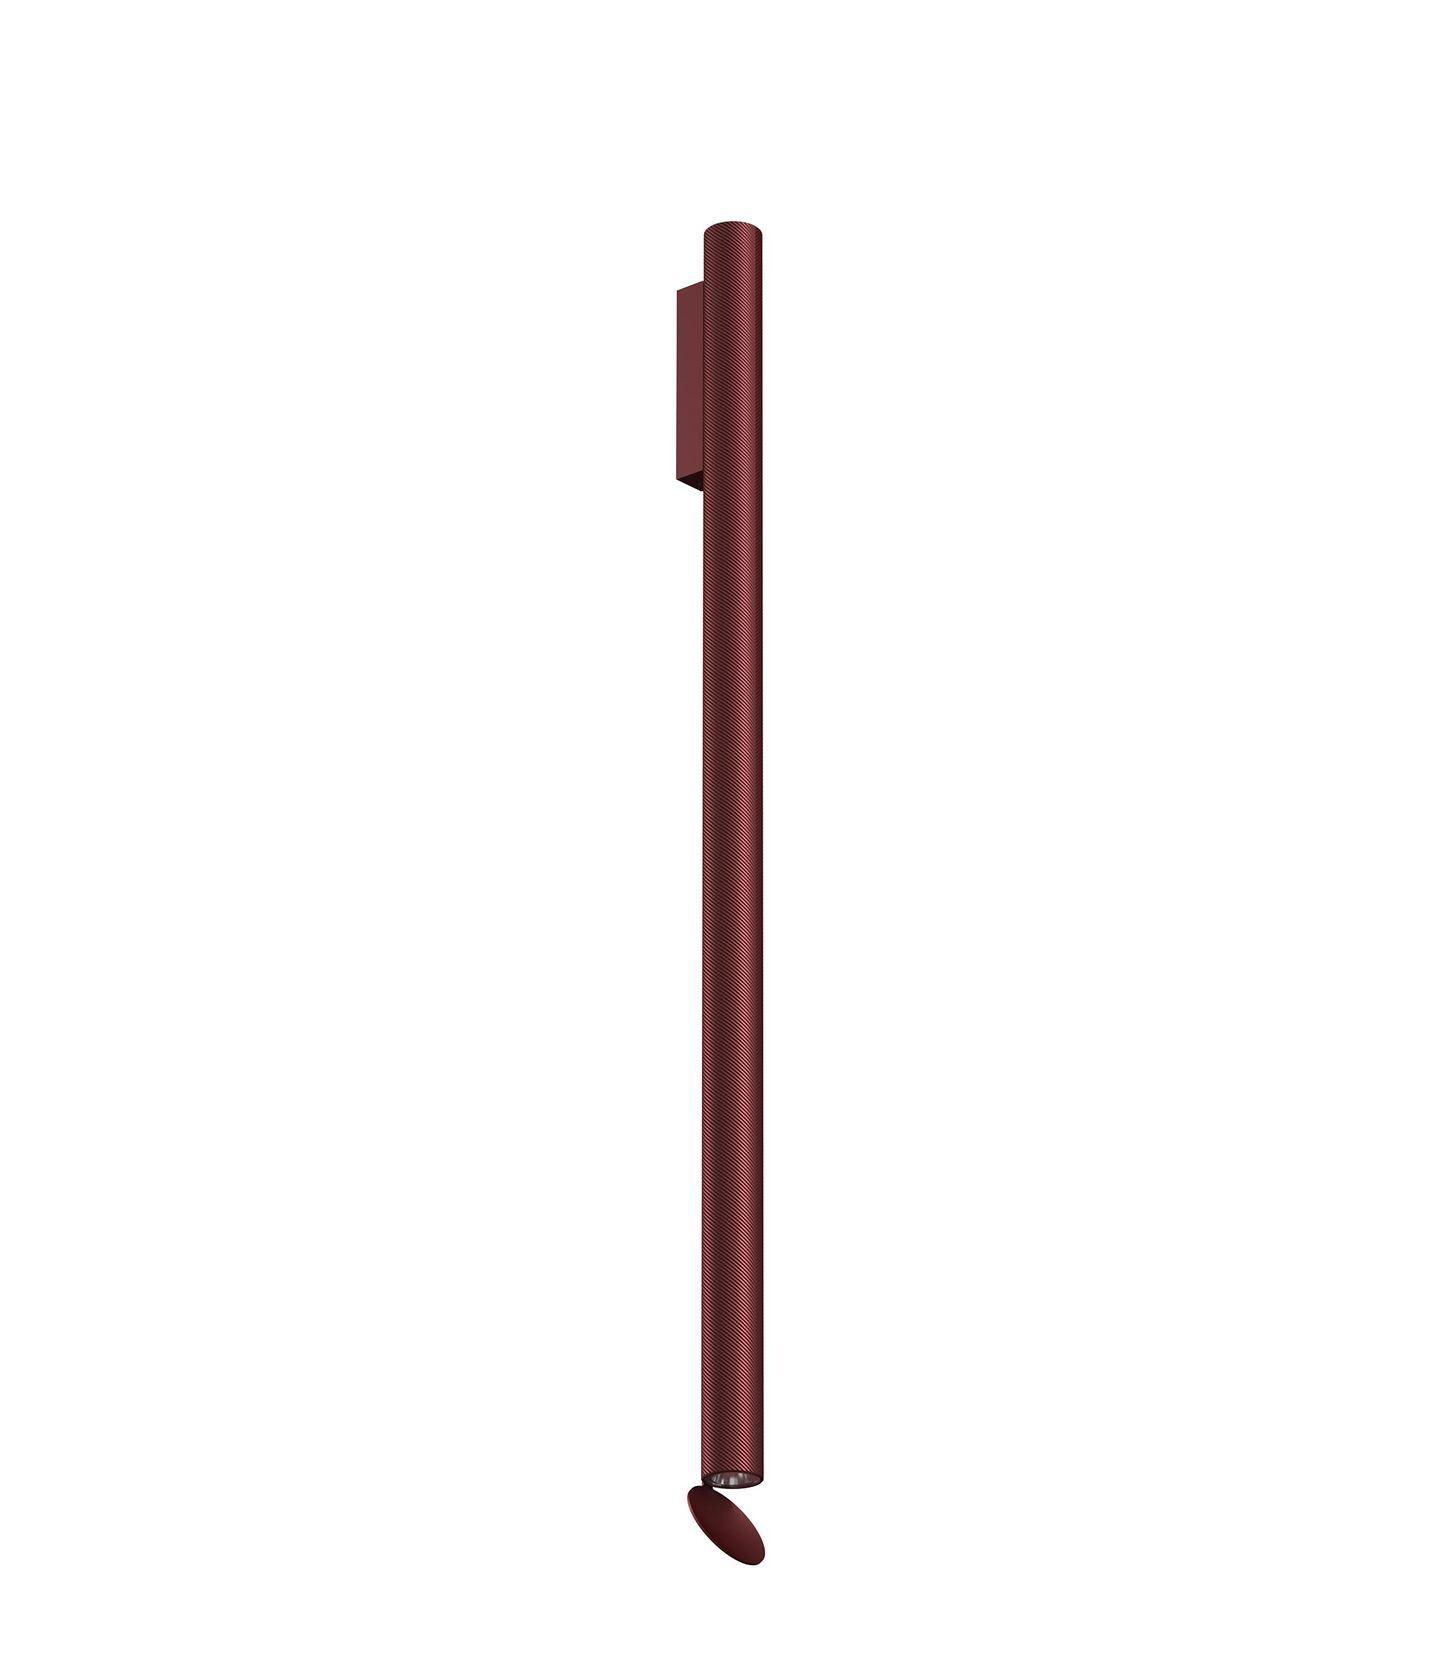 Flauta-ceiling-wall-urquiola-flos-F2345035-product-still-life-big